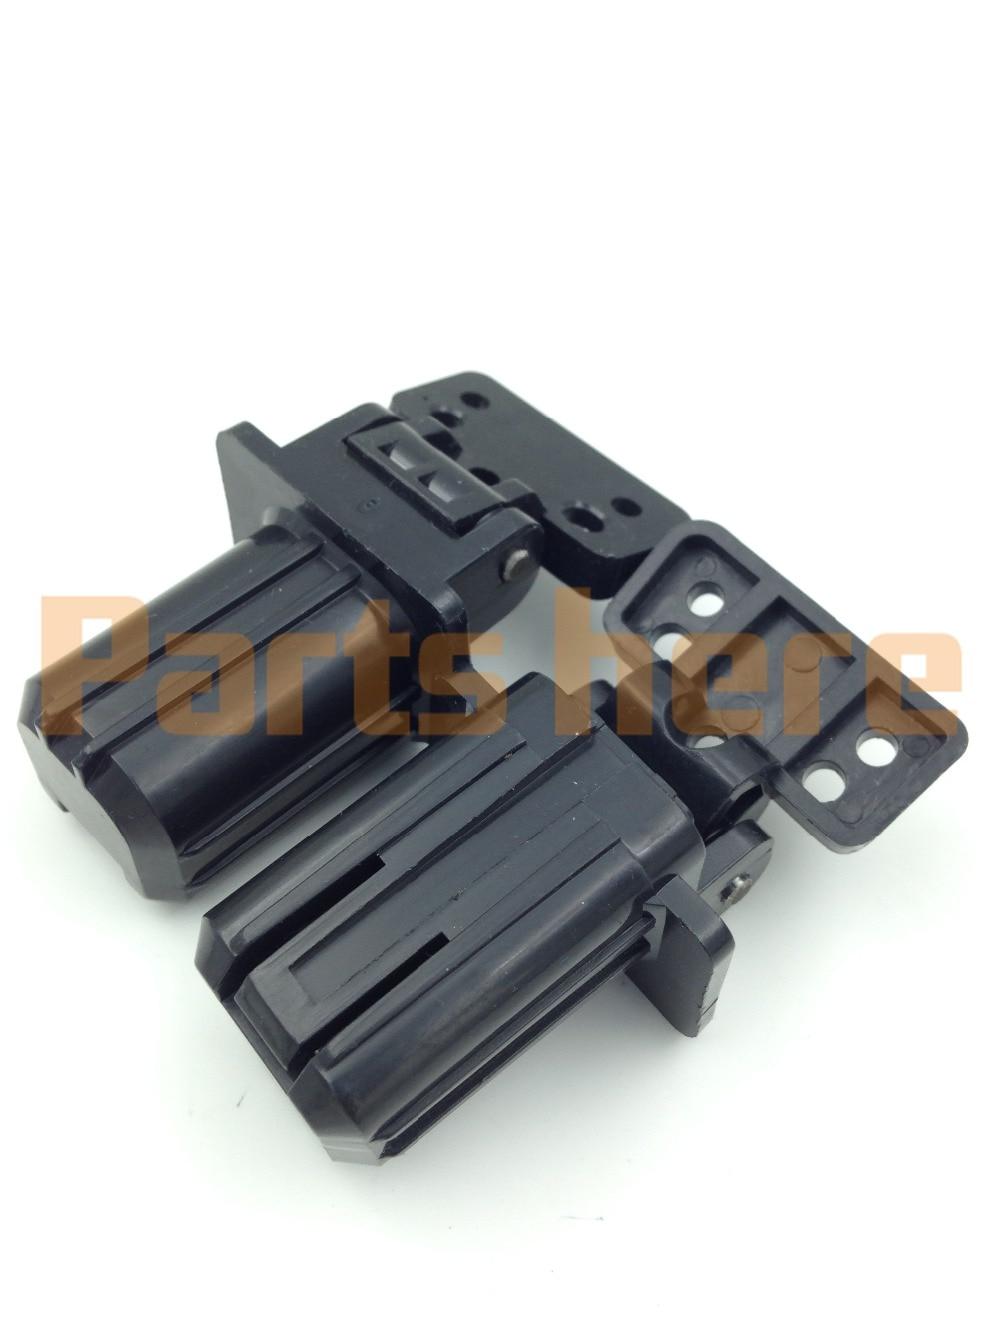 10 قطعة X جديد CF288-60027 CF288-60030 عاصي-ADF المفصلي ADF المفصلي الجمعية ل HP برو 400 MFP M401 M425 M425DN M425DW M521 M525